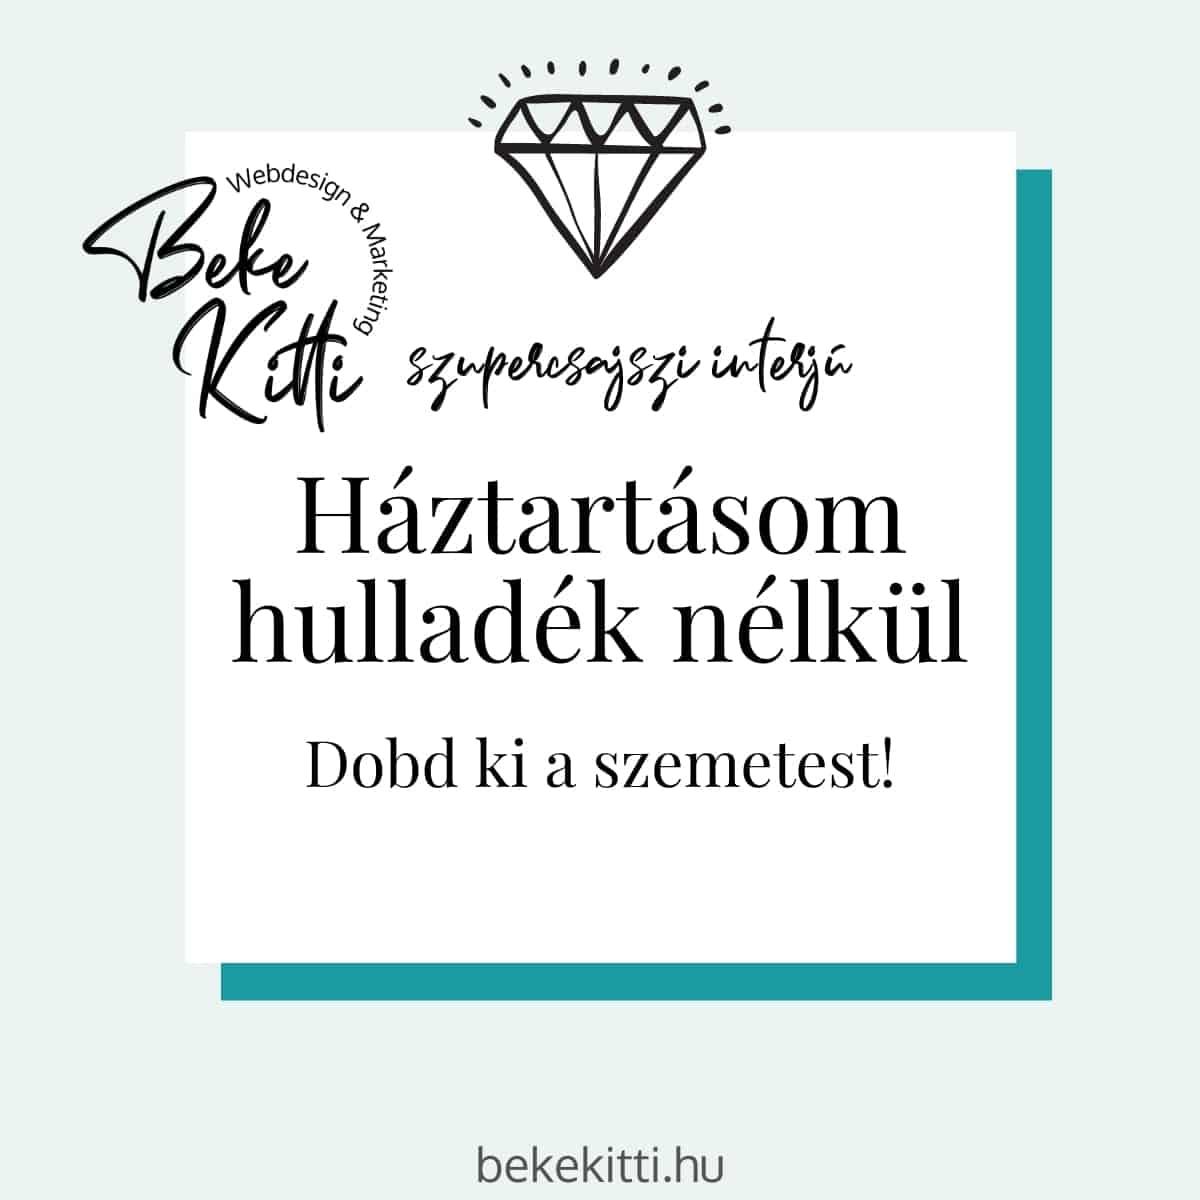 Szupercsajszi Interju Haztartasom Hulladek Nelkul Beke Kitti borítókép